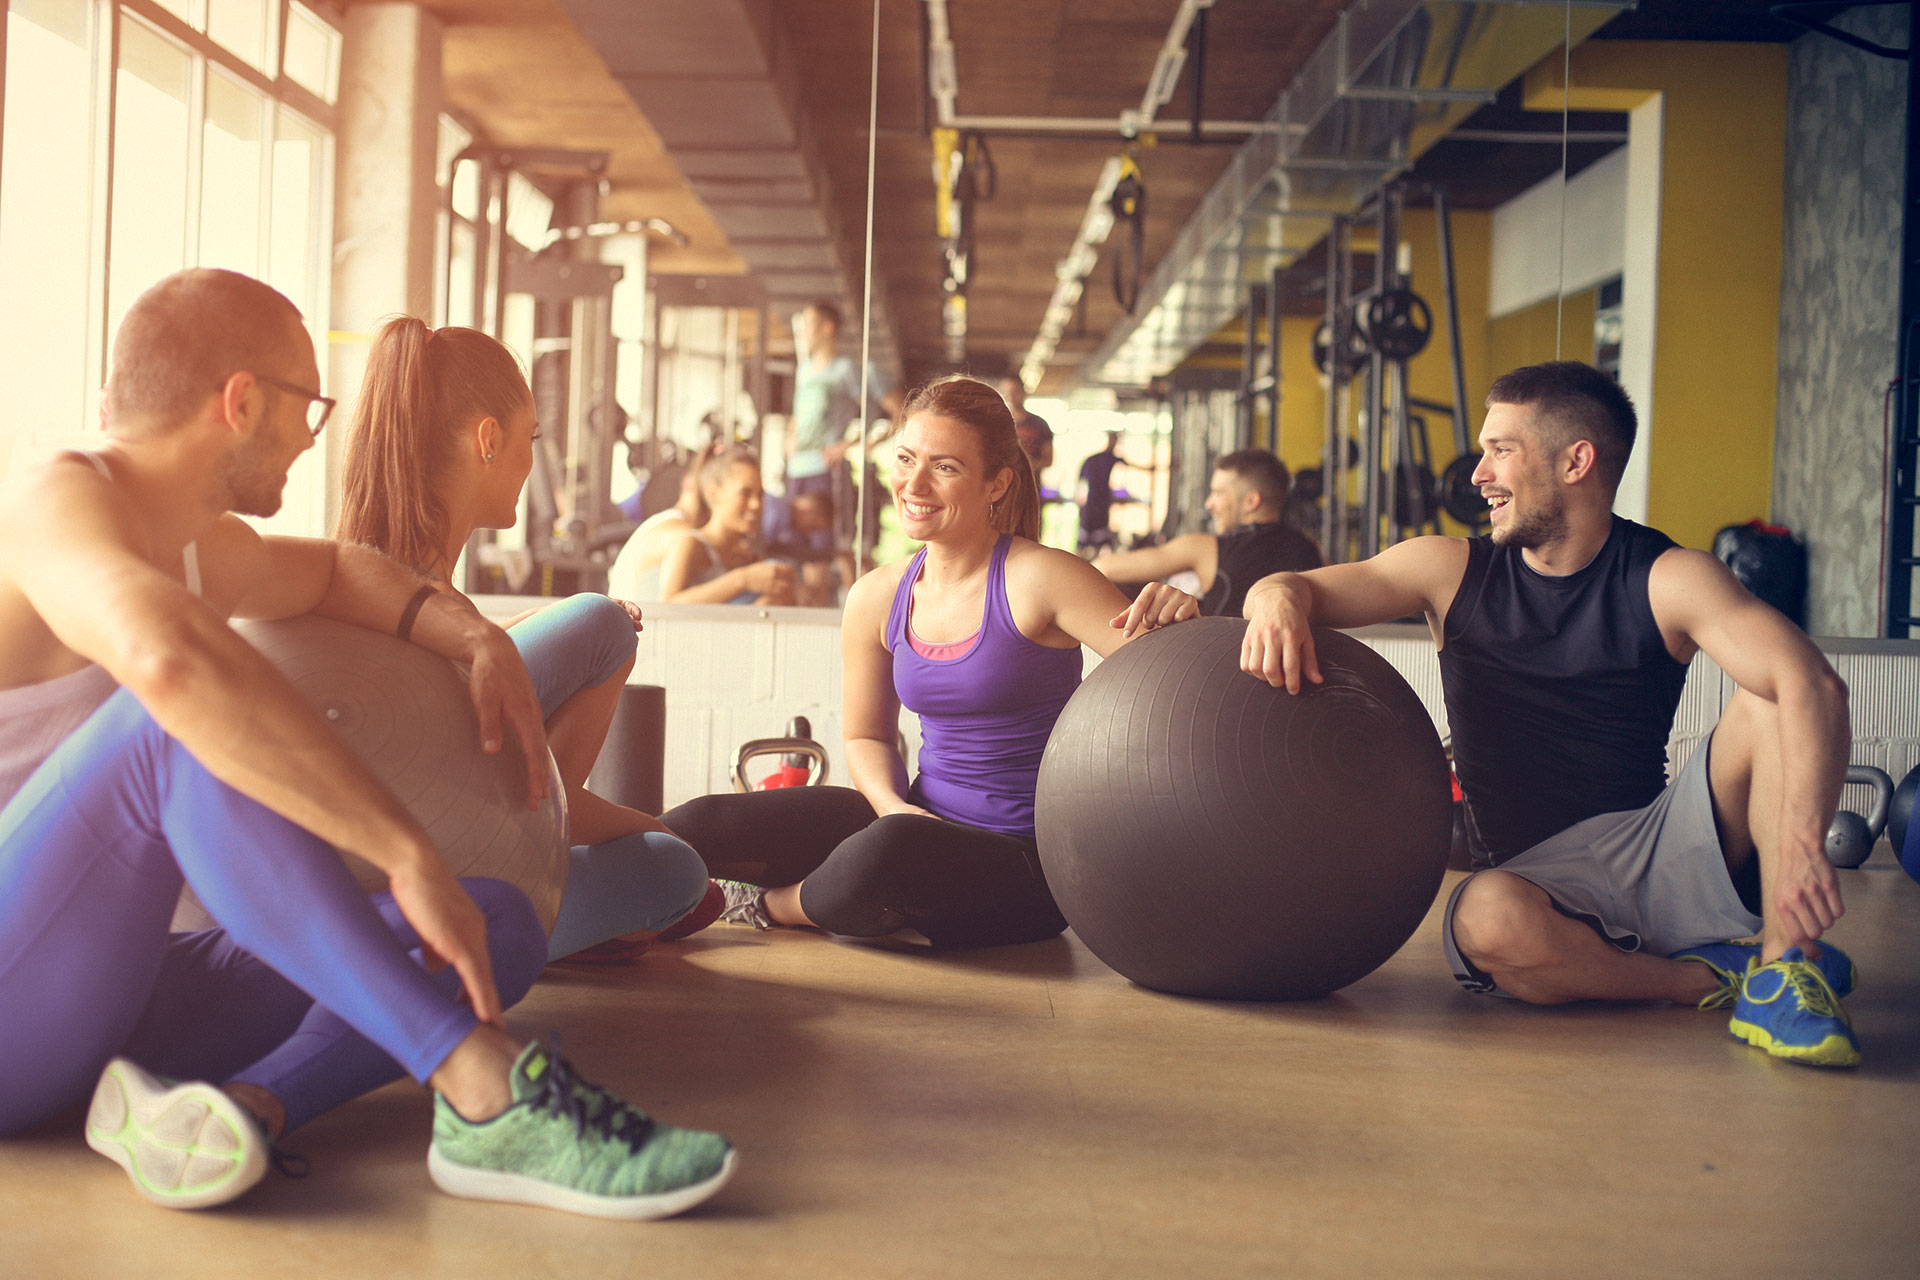 Kursangebot Bodystyling Sportfabrik Bonn